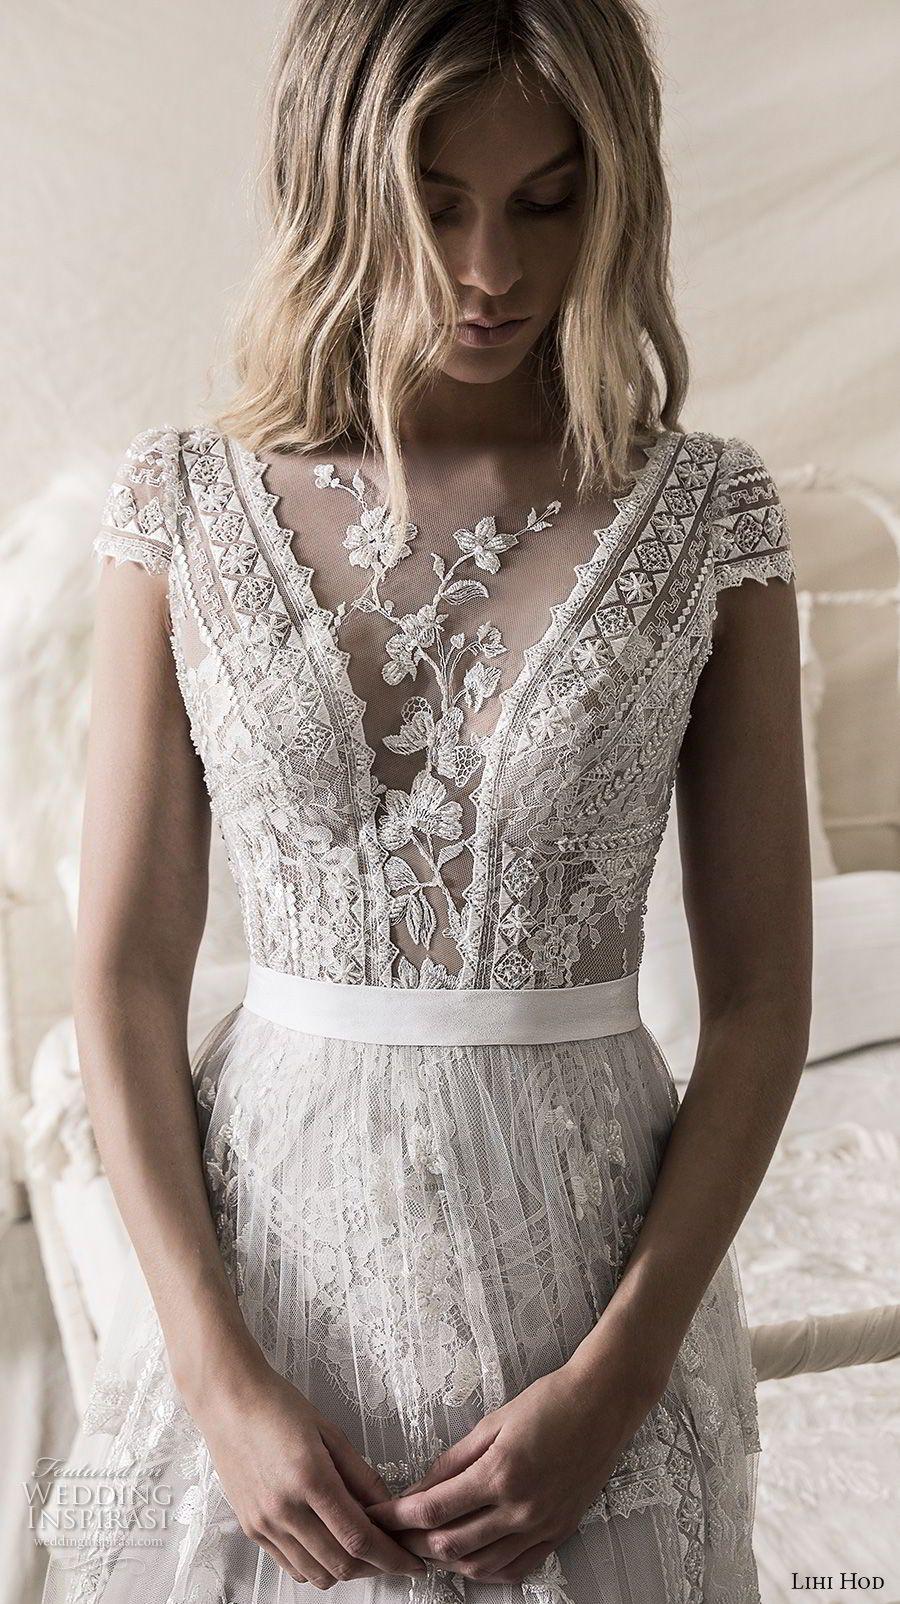 Bridal wedding dresses  Lihi Hod  Wedding Dresses u ucA Whiter Shade of Paleud Bridal